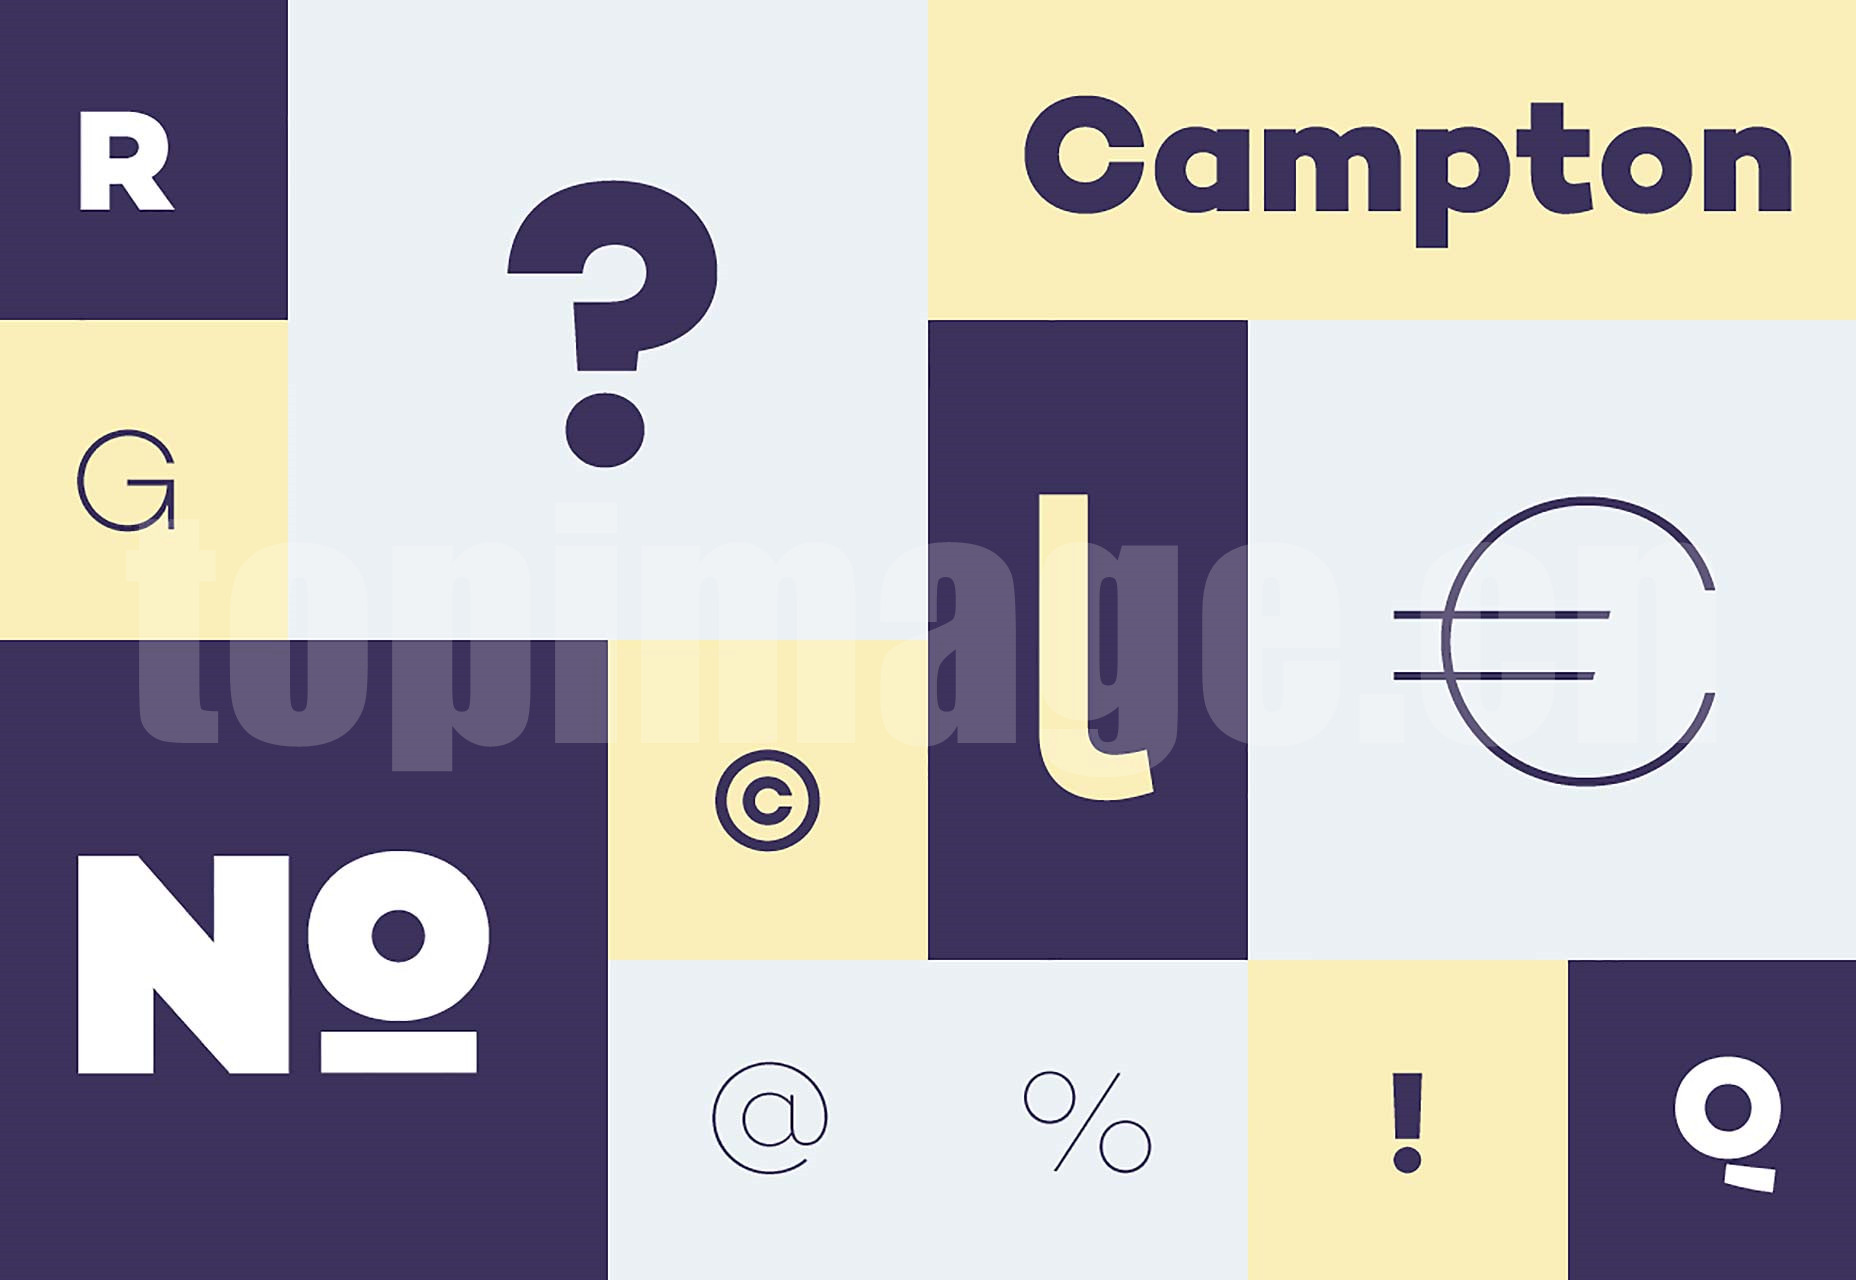 Campton创意海报 经典优雅 logo英文字体下载